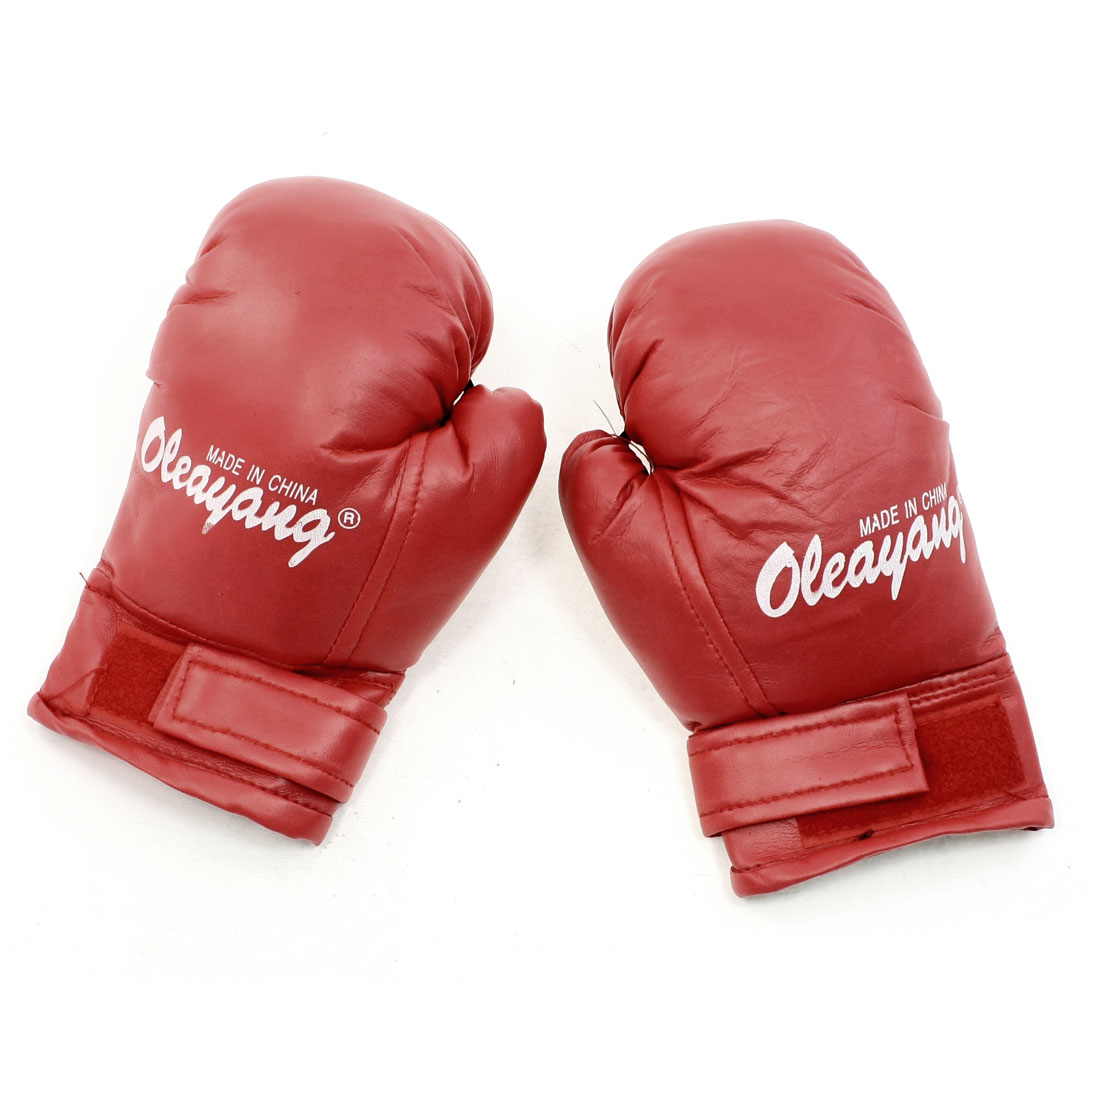 Unique Bargains Professional Sport Faux Leather   Boxing Gloves Red